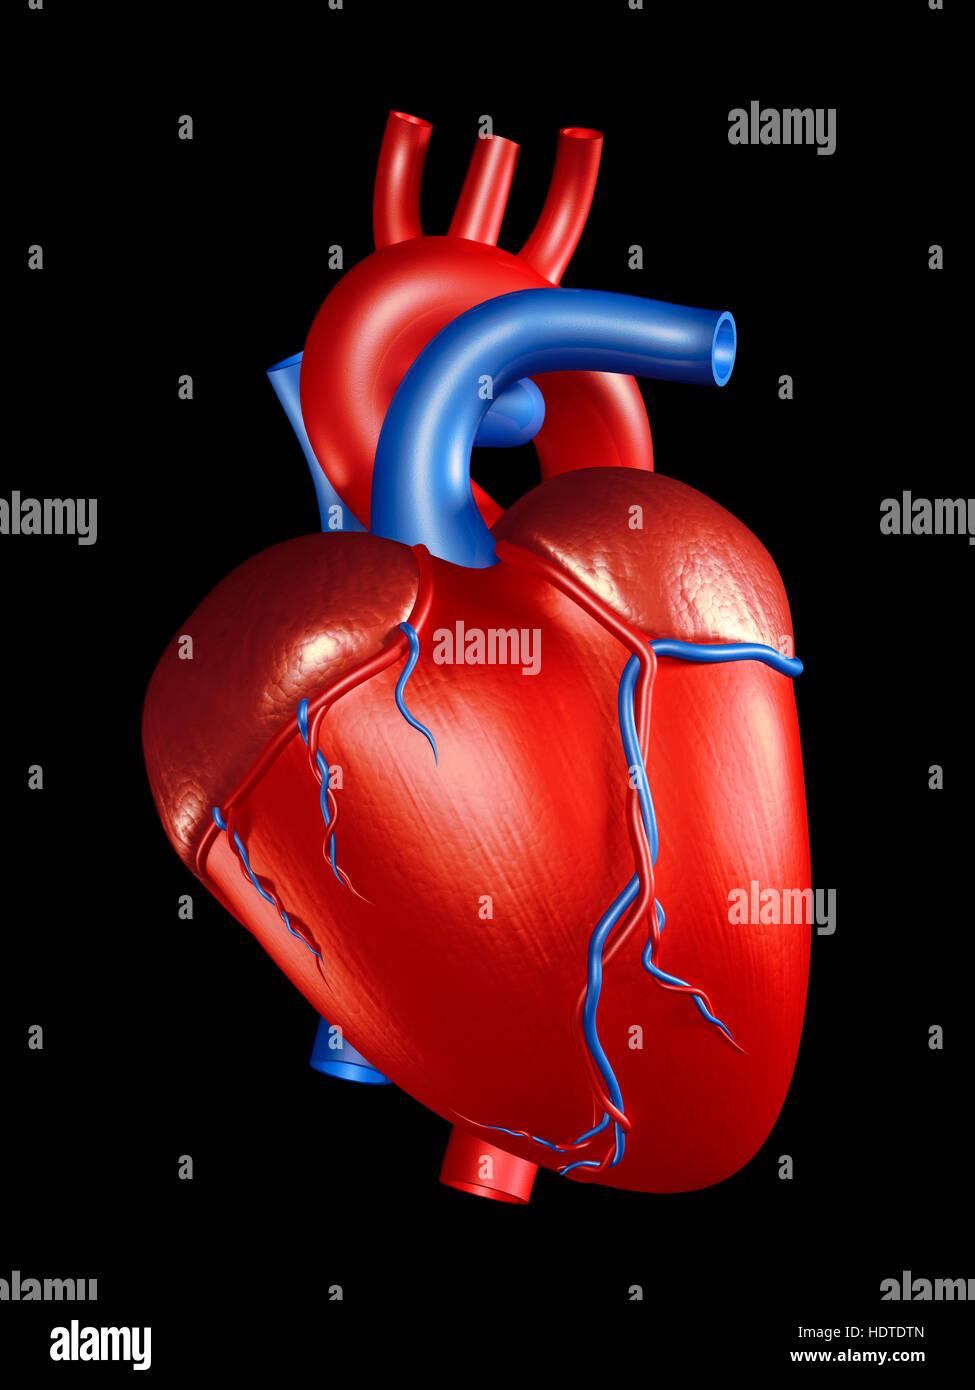 Menschliches Herz, 3D illustration Stockbild